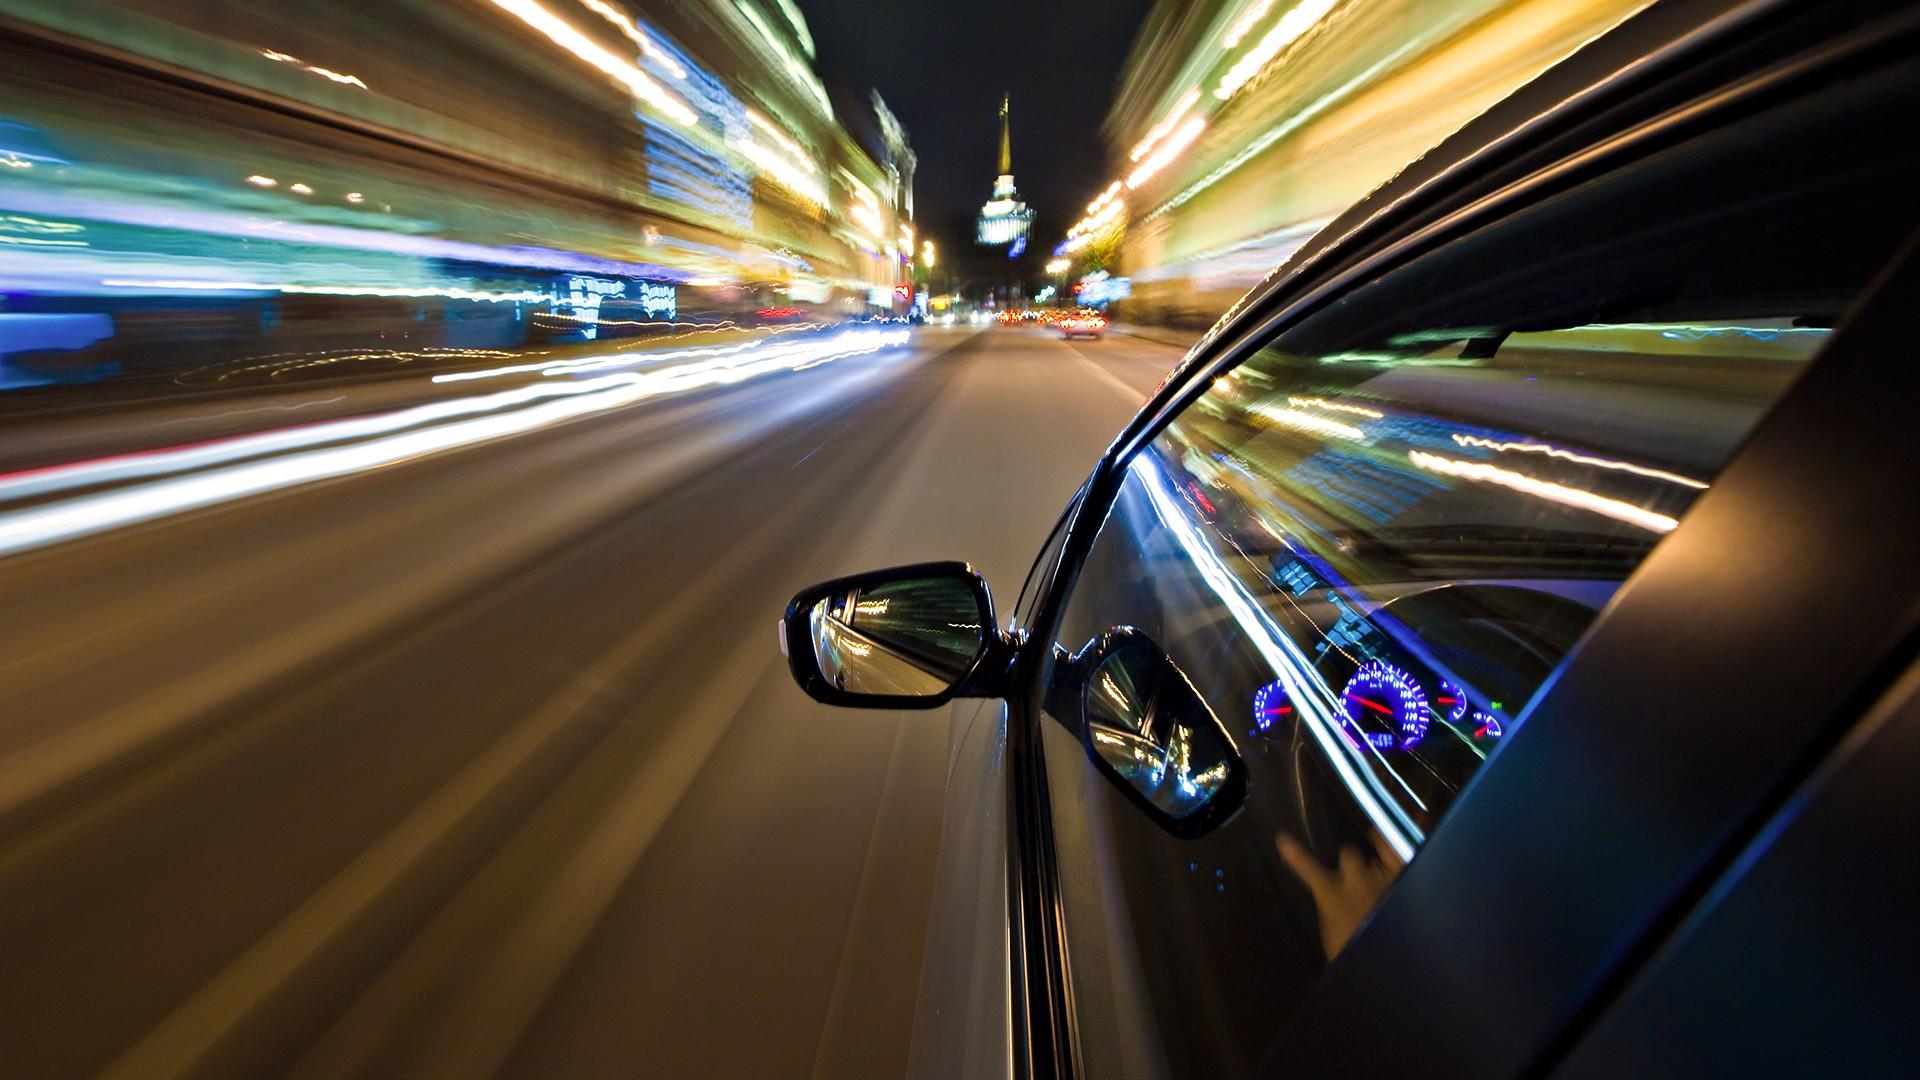 802947-cars-cities-lights-night-vehicles